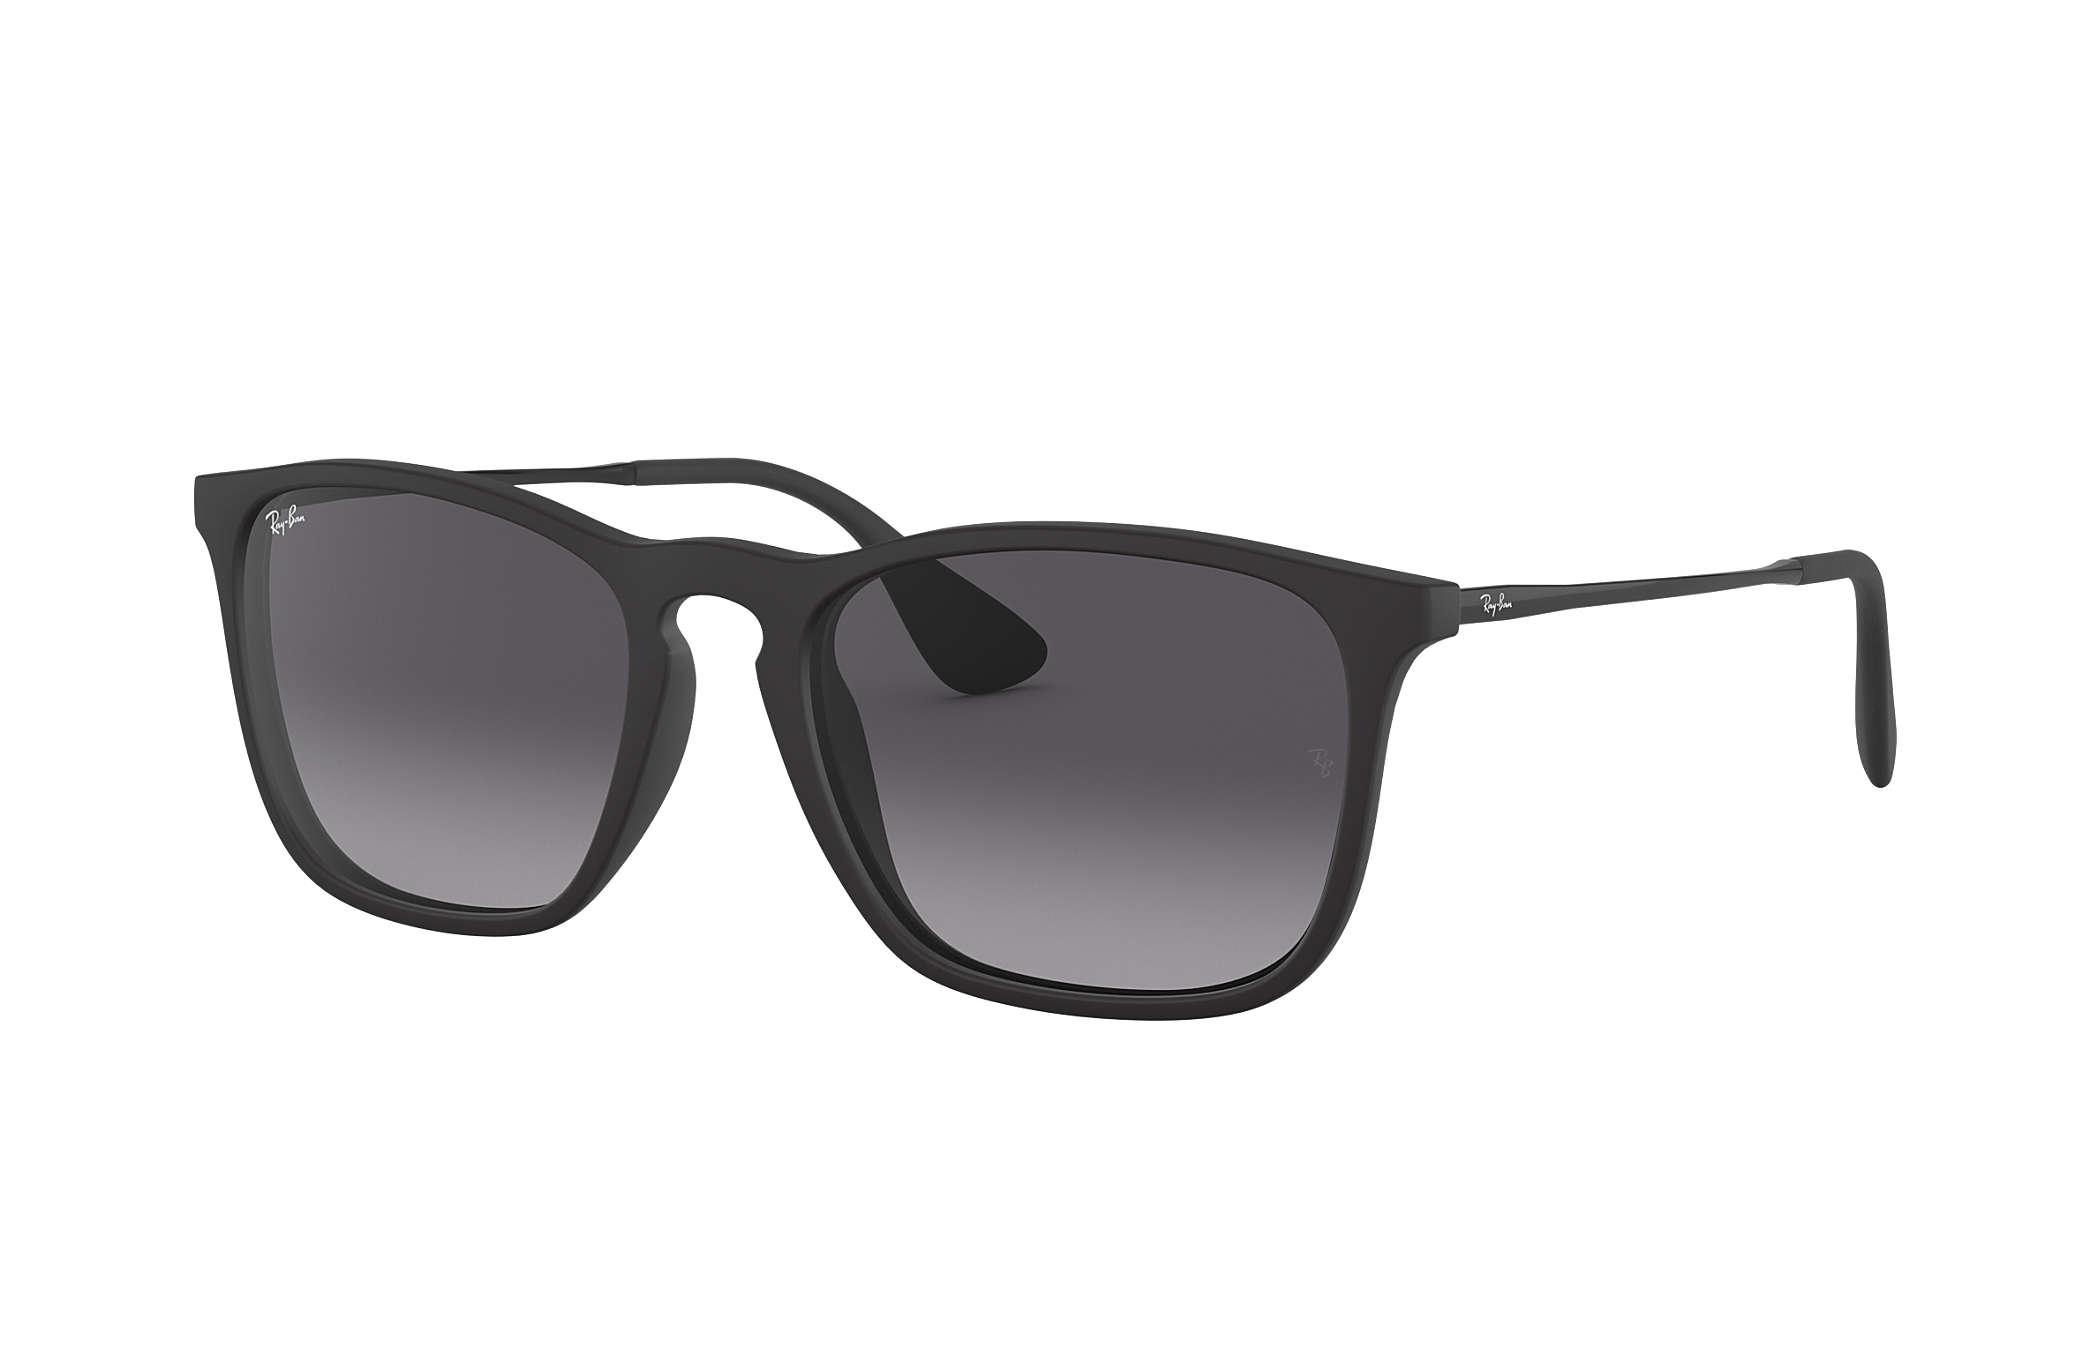 ray bans sunglasses debenhams  ray ban 0rb4187 chris black sun